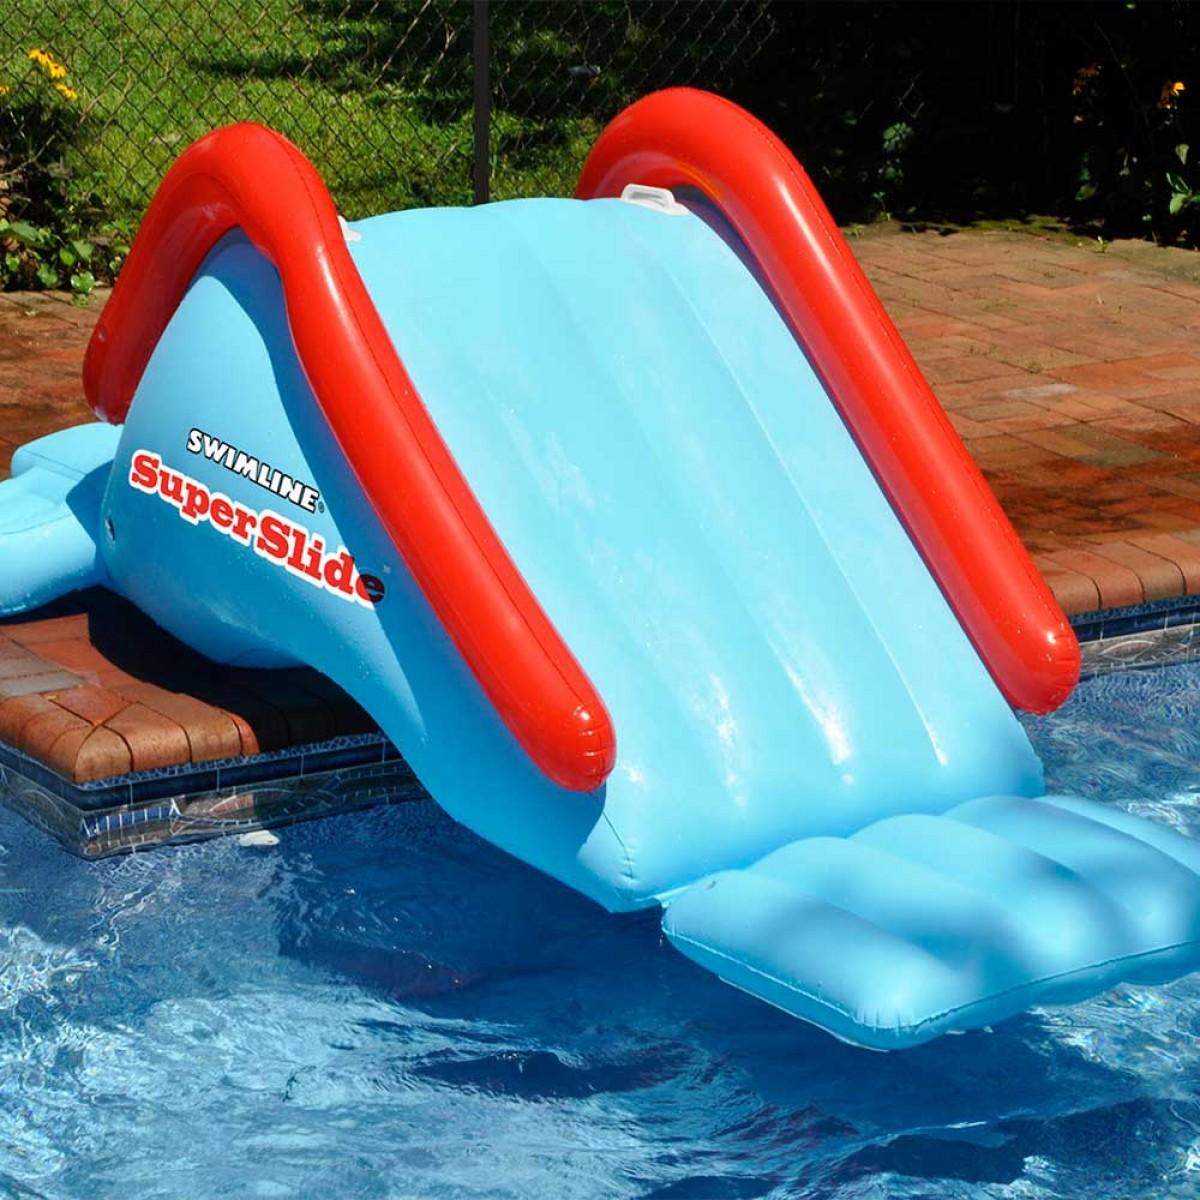 Swimline super slide inflatable pool slide for Garden pool inflatable